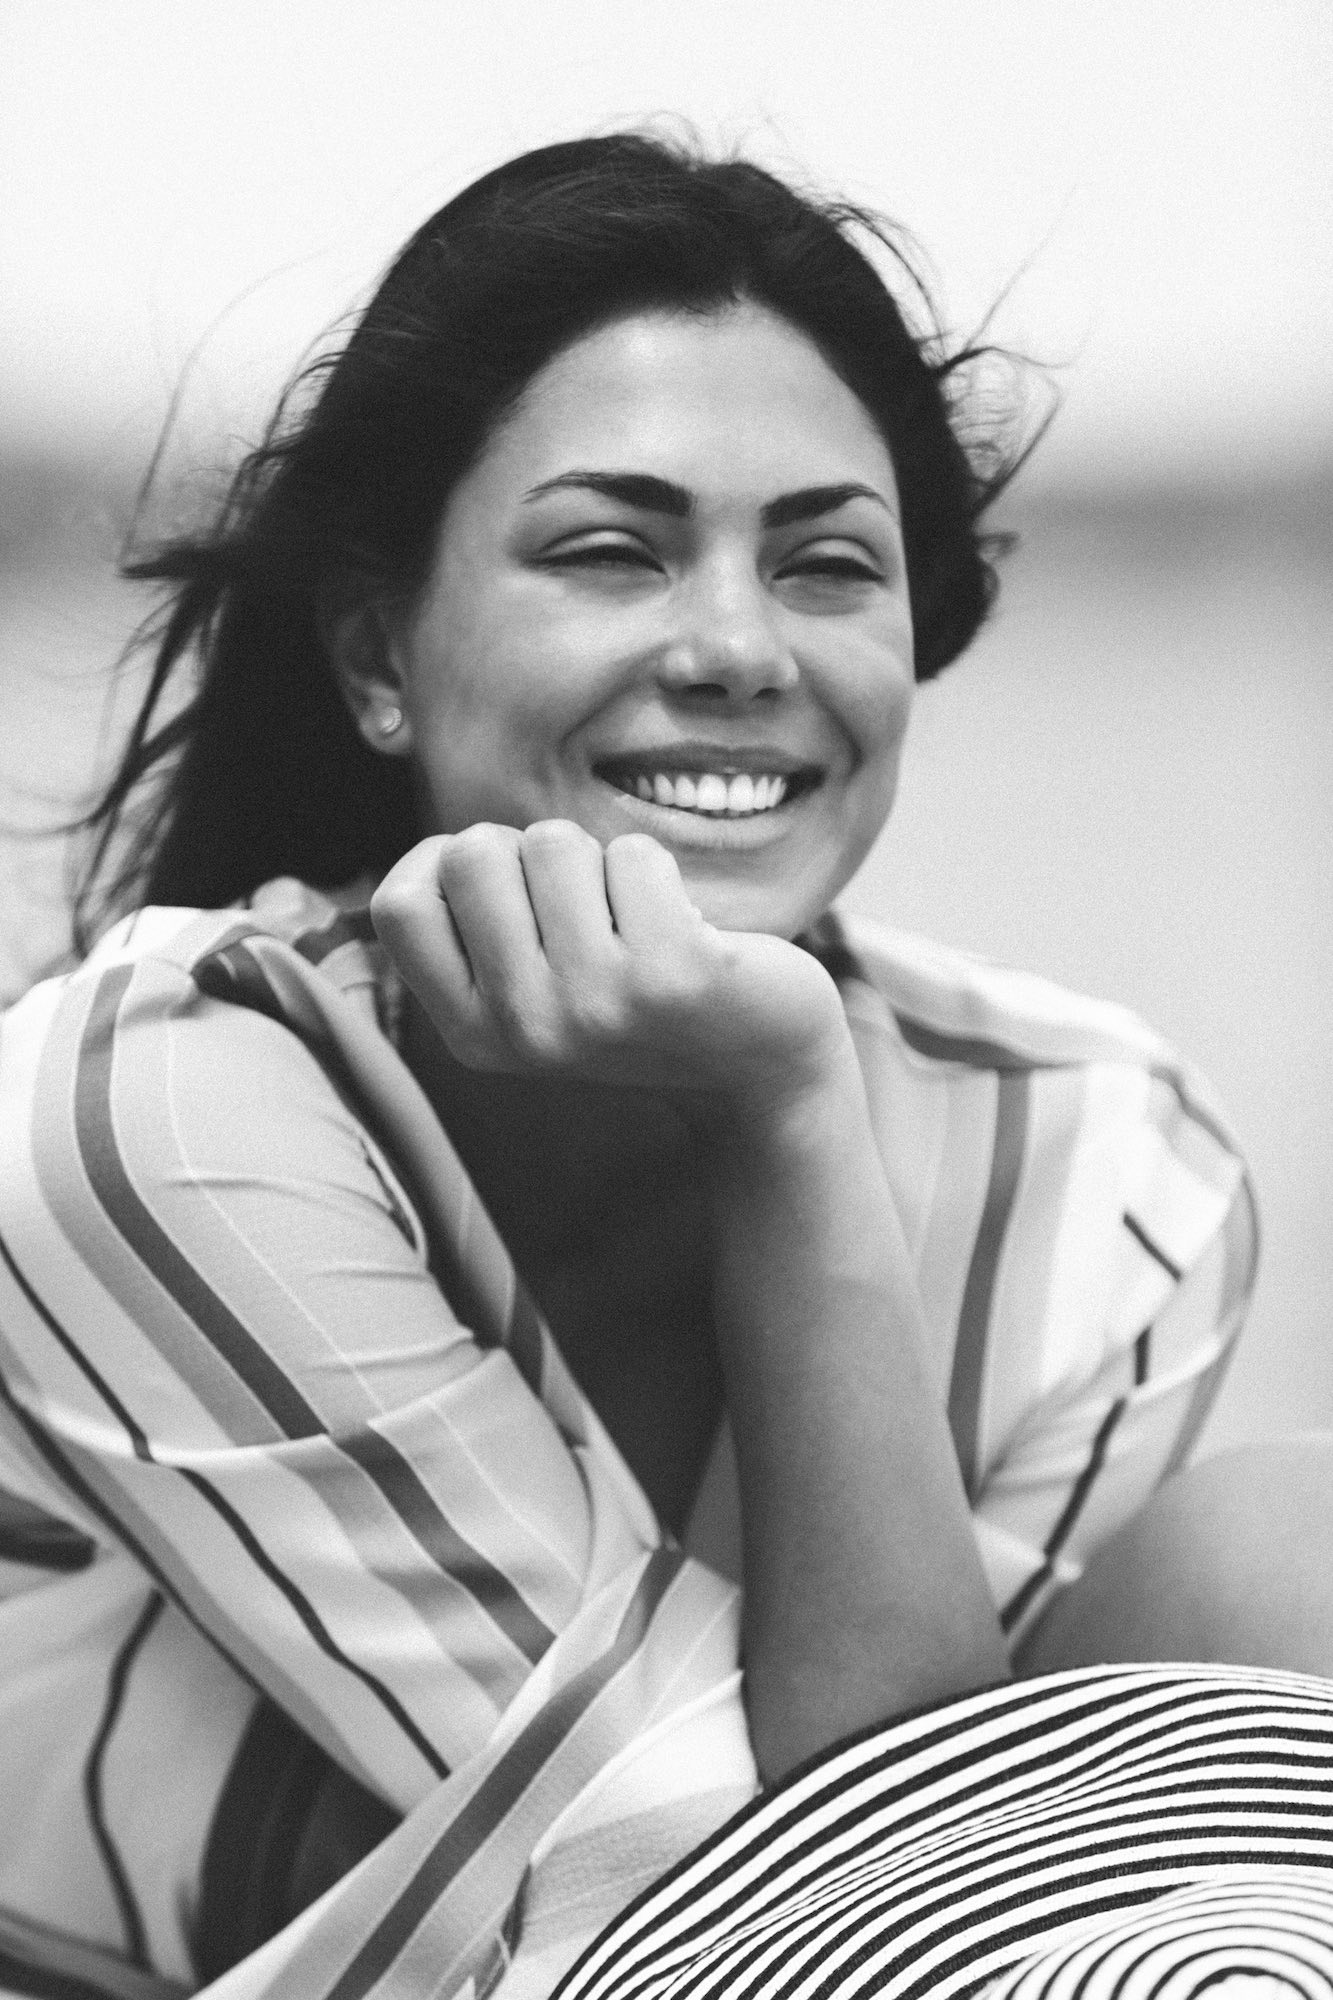 amanda smile